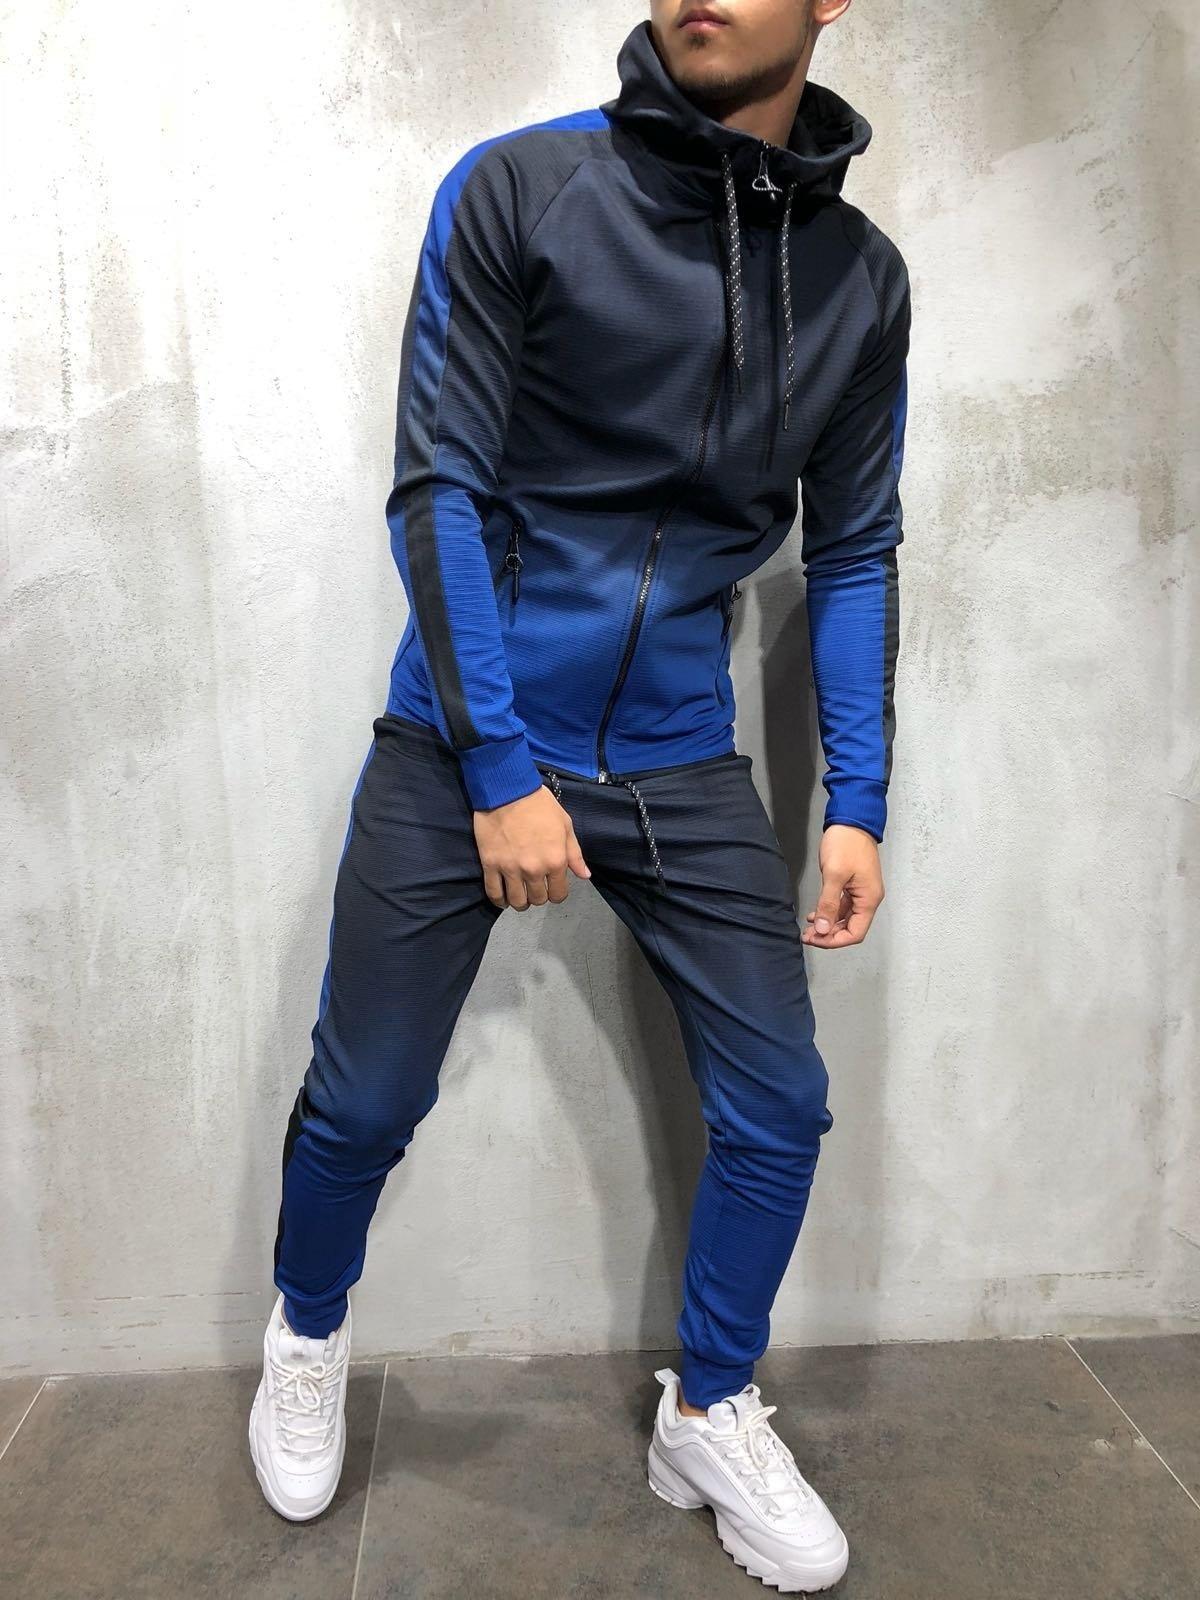 Zogaa 2019 New Fashion Men Set Long Sleeve Hoodies + Pants Set Male Tracksuit Outdoor Suit Men's Gyms Set Sporting Suit Male Set